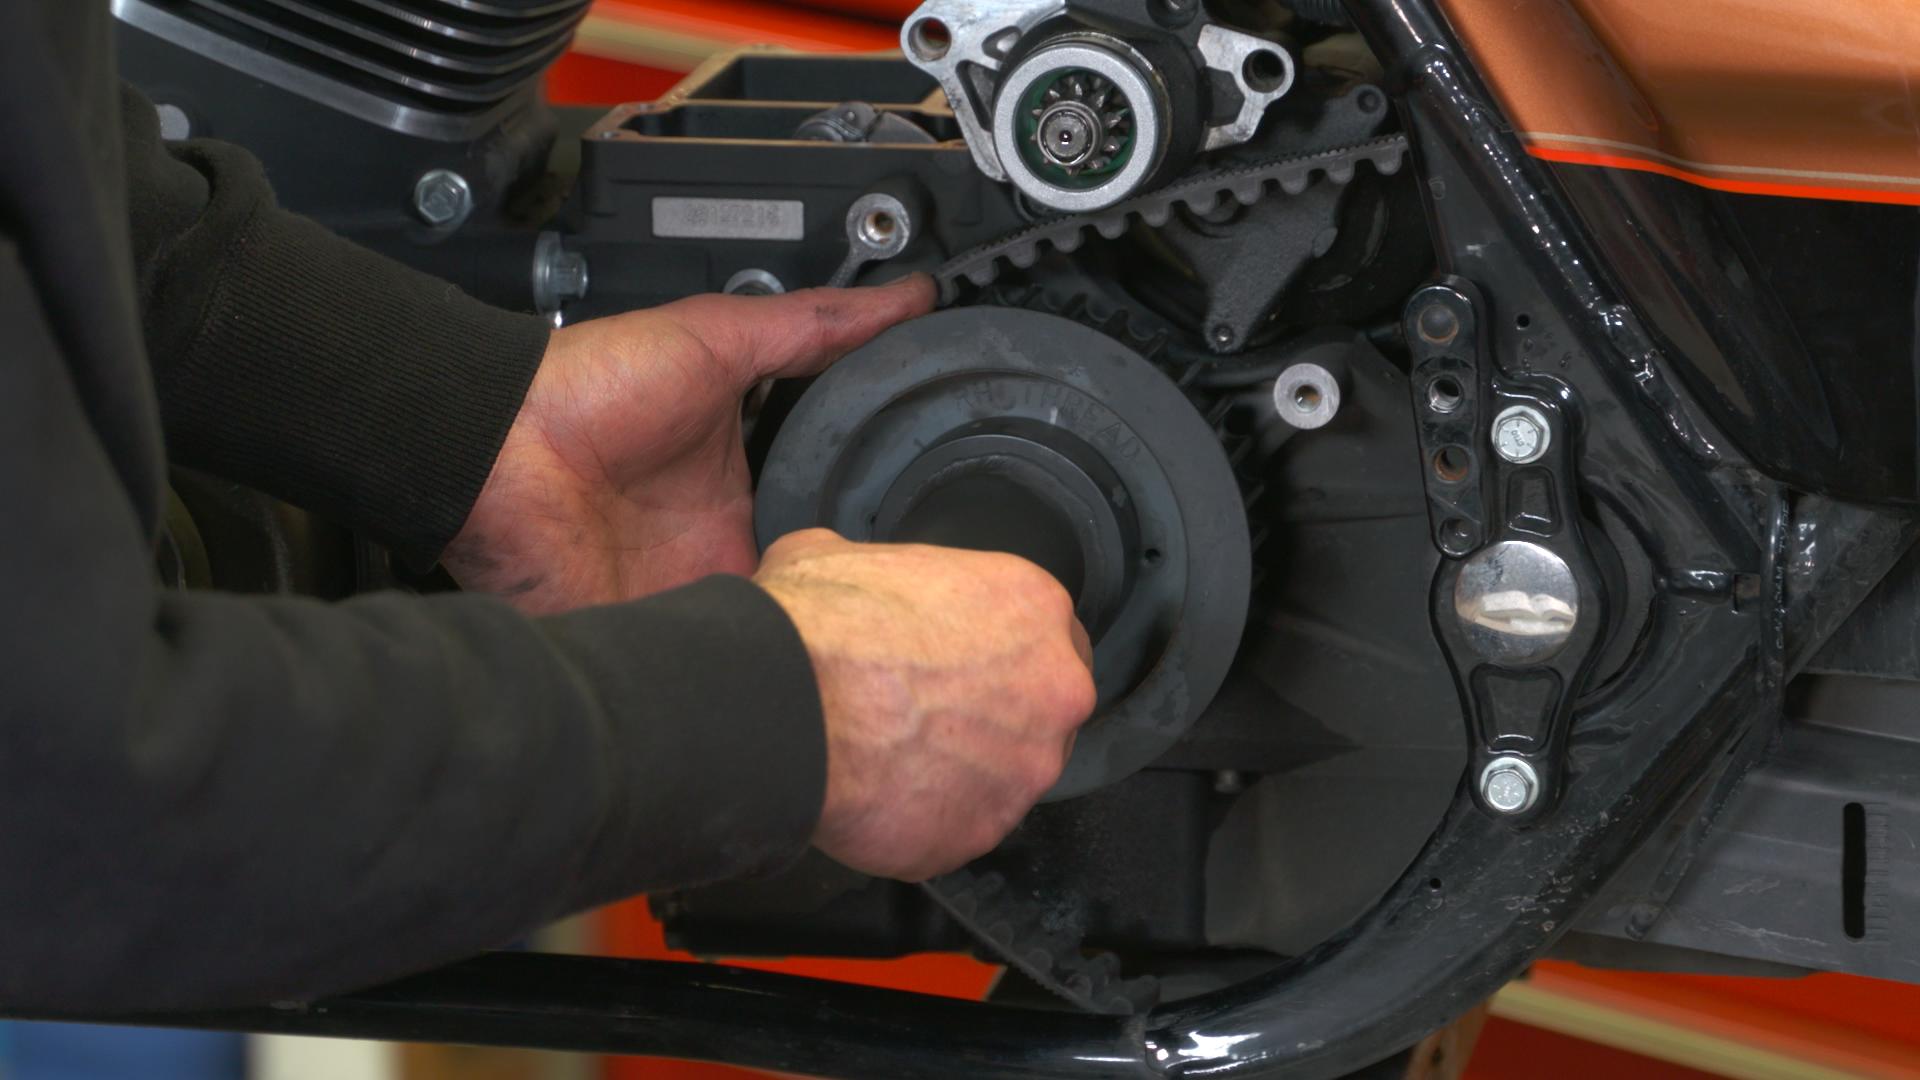 Harley 6 Speed Gear Set Install During Transmission Rebuild